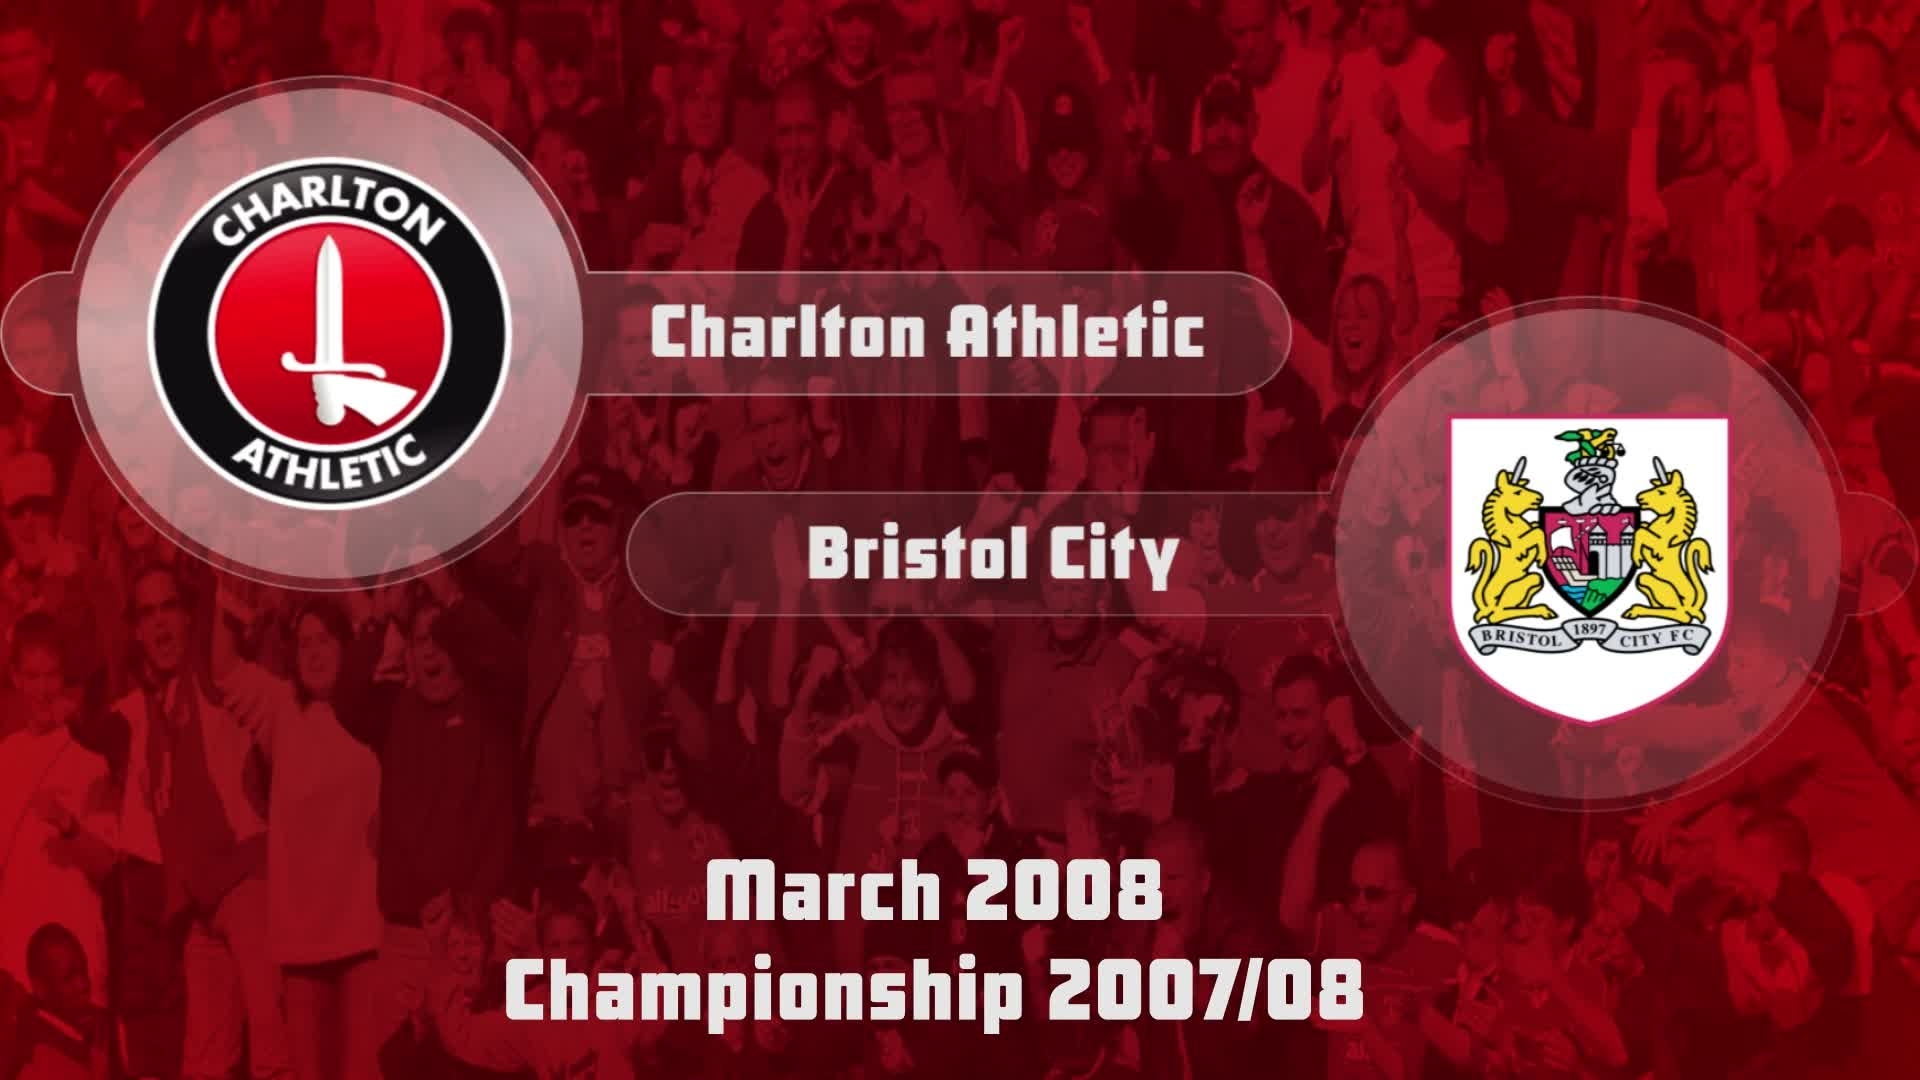 41 HIGHLIGHTS | Charlton 1 Bristol City 1 (March 2008)